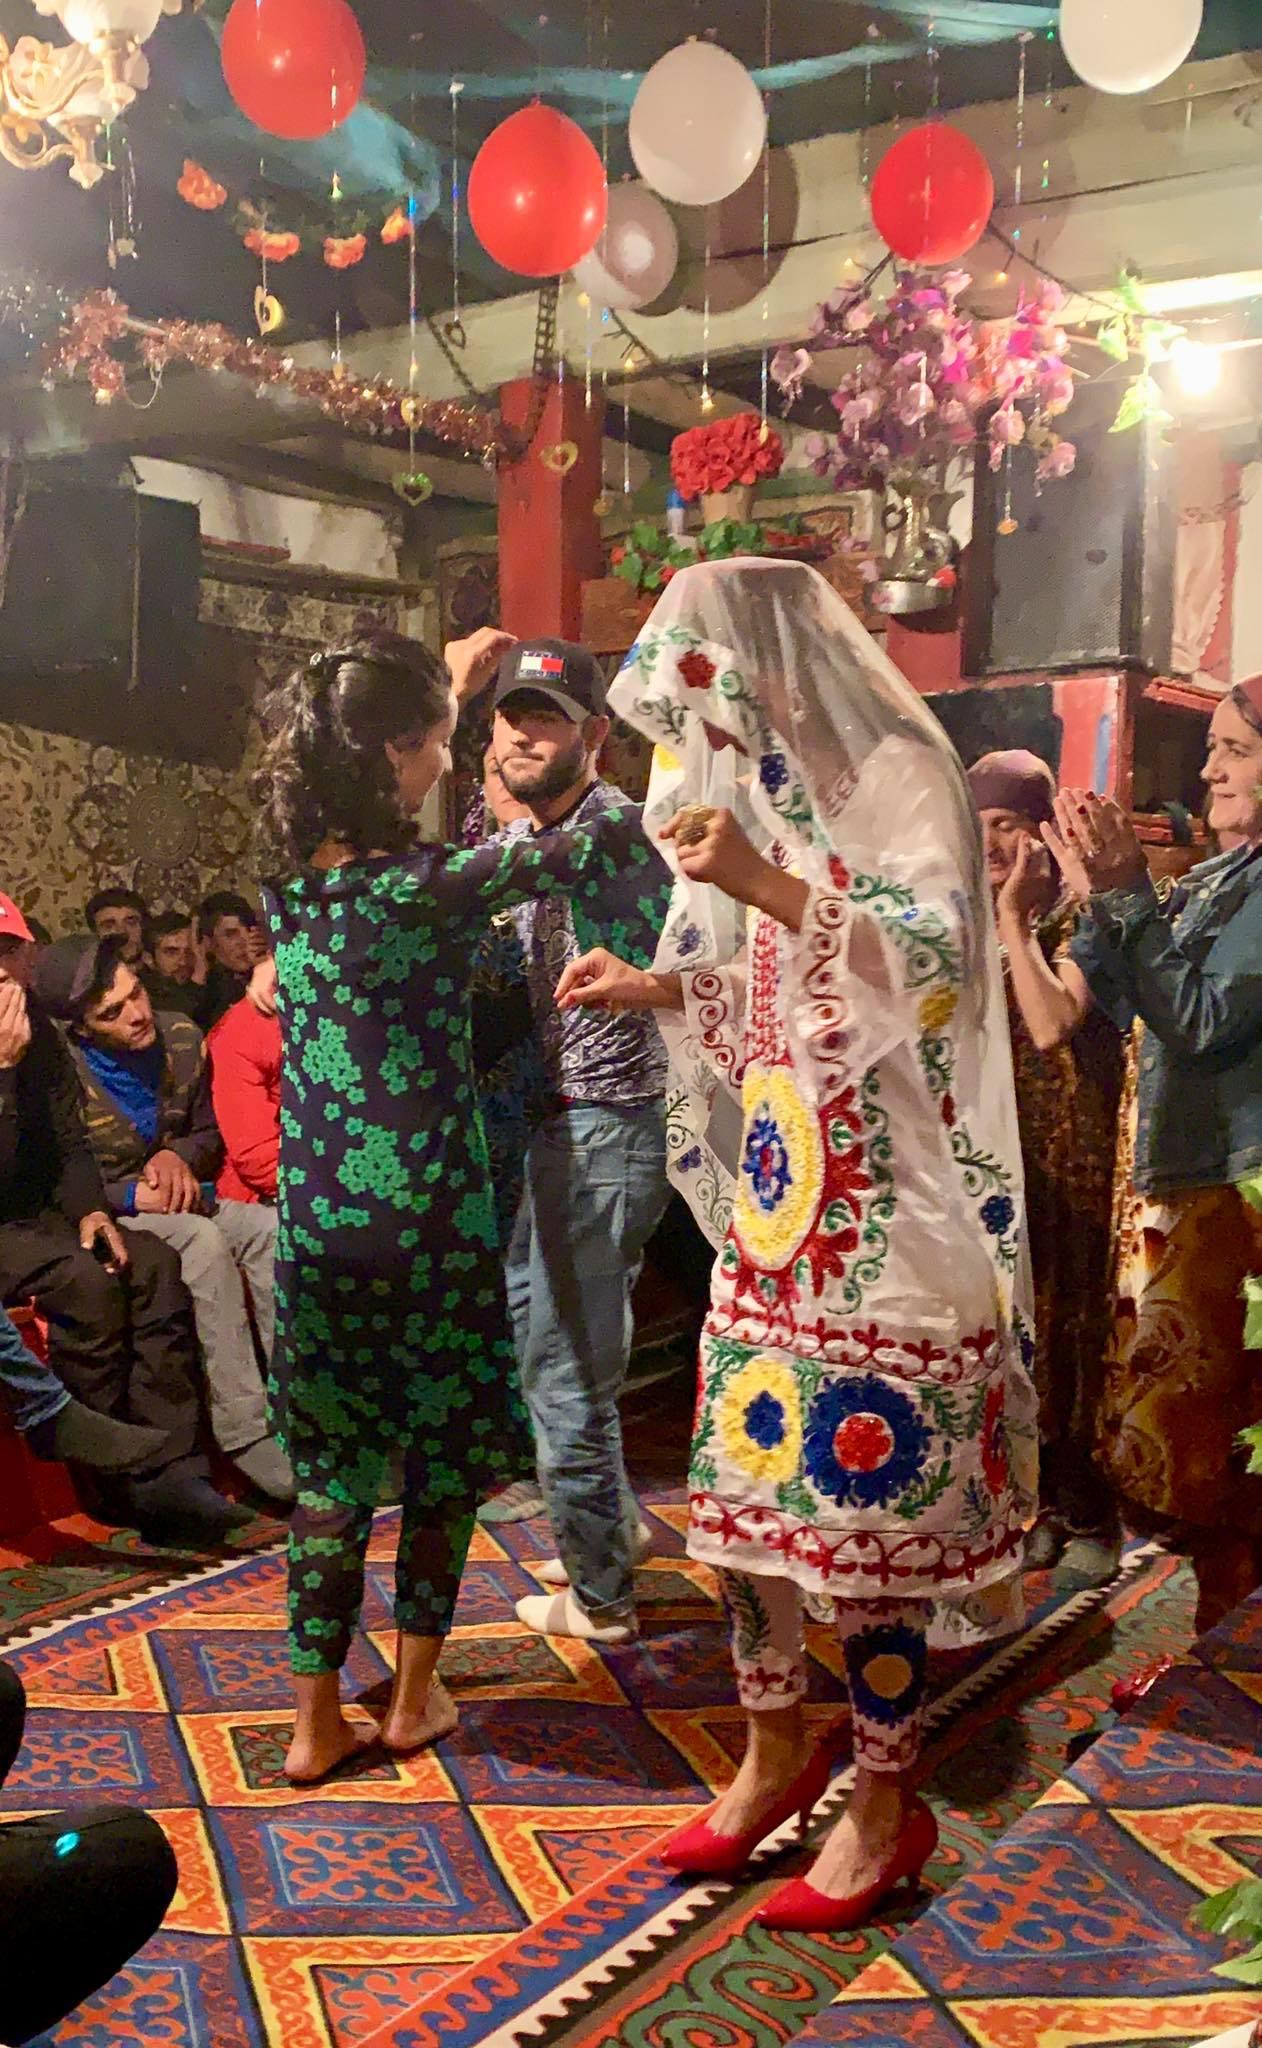 Kach Solo Travels in 2019 Experiencing a Traditional Wakhan Wedding in Tajikistan2.jpg